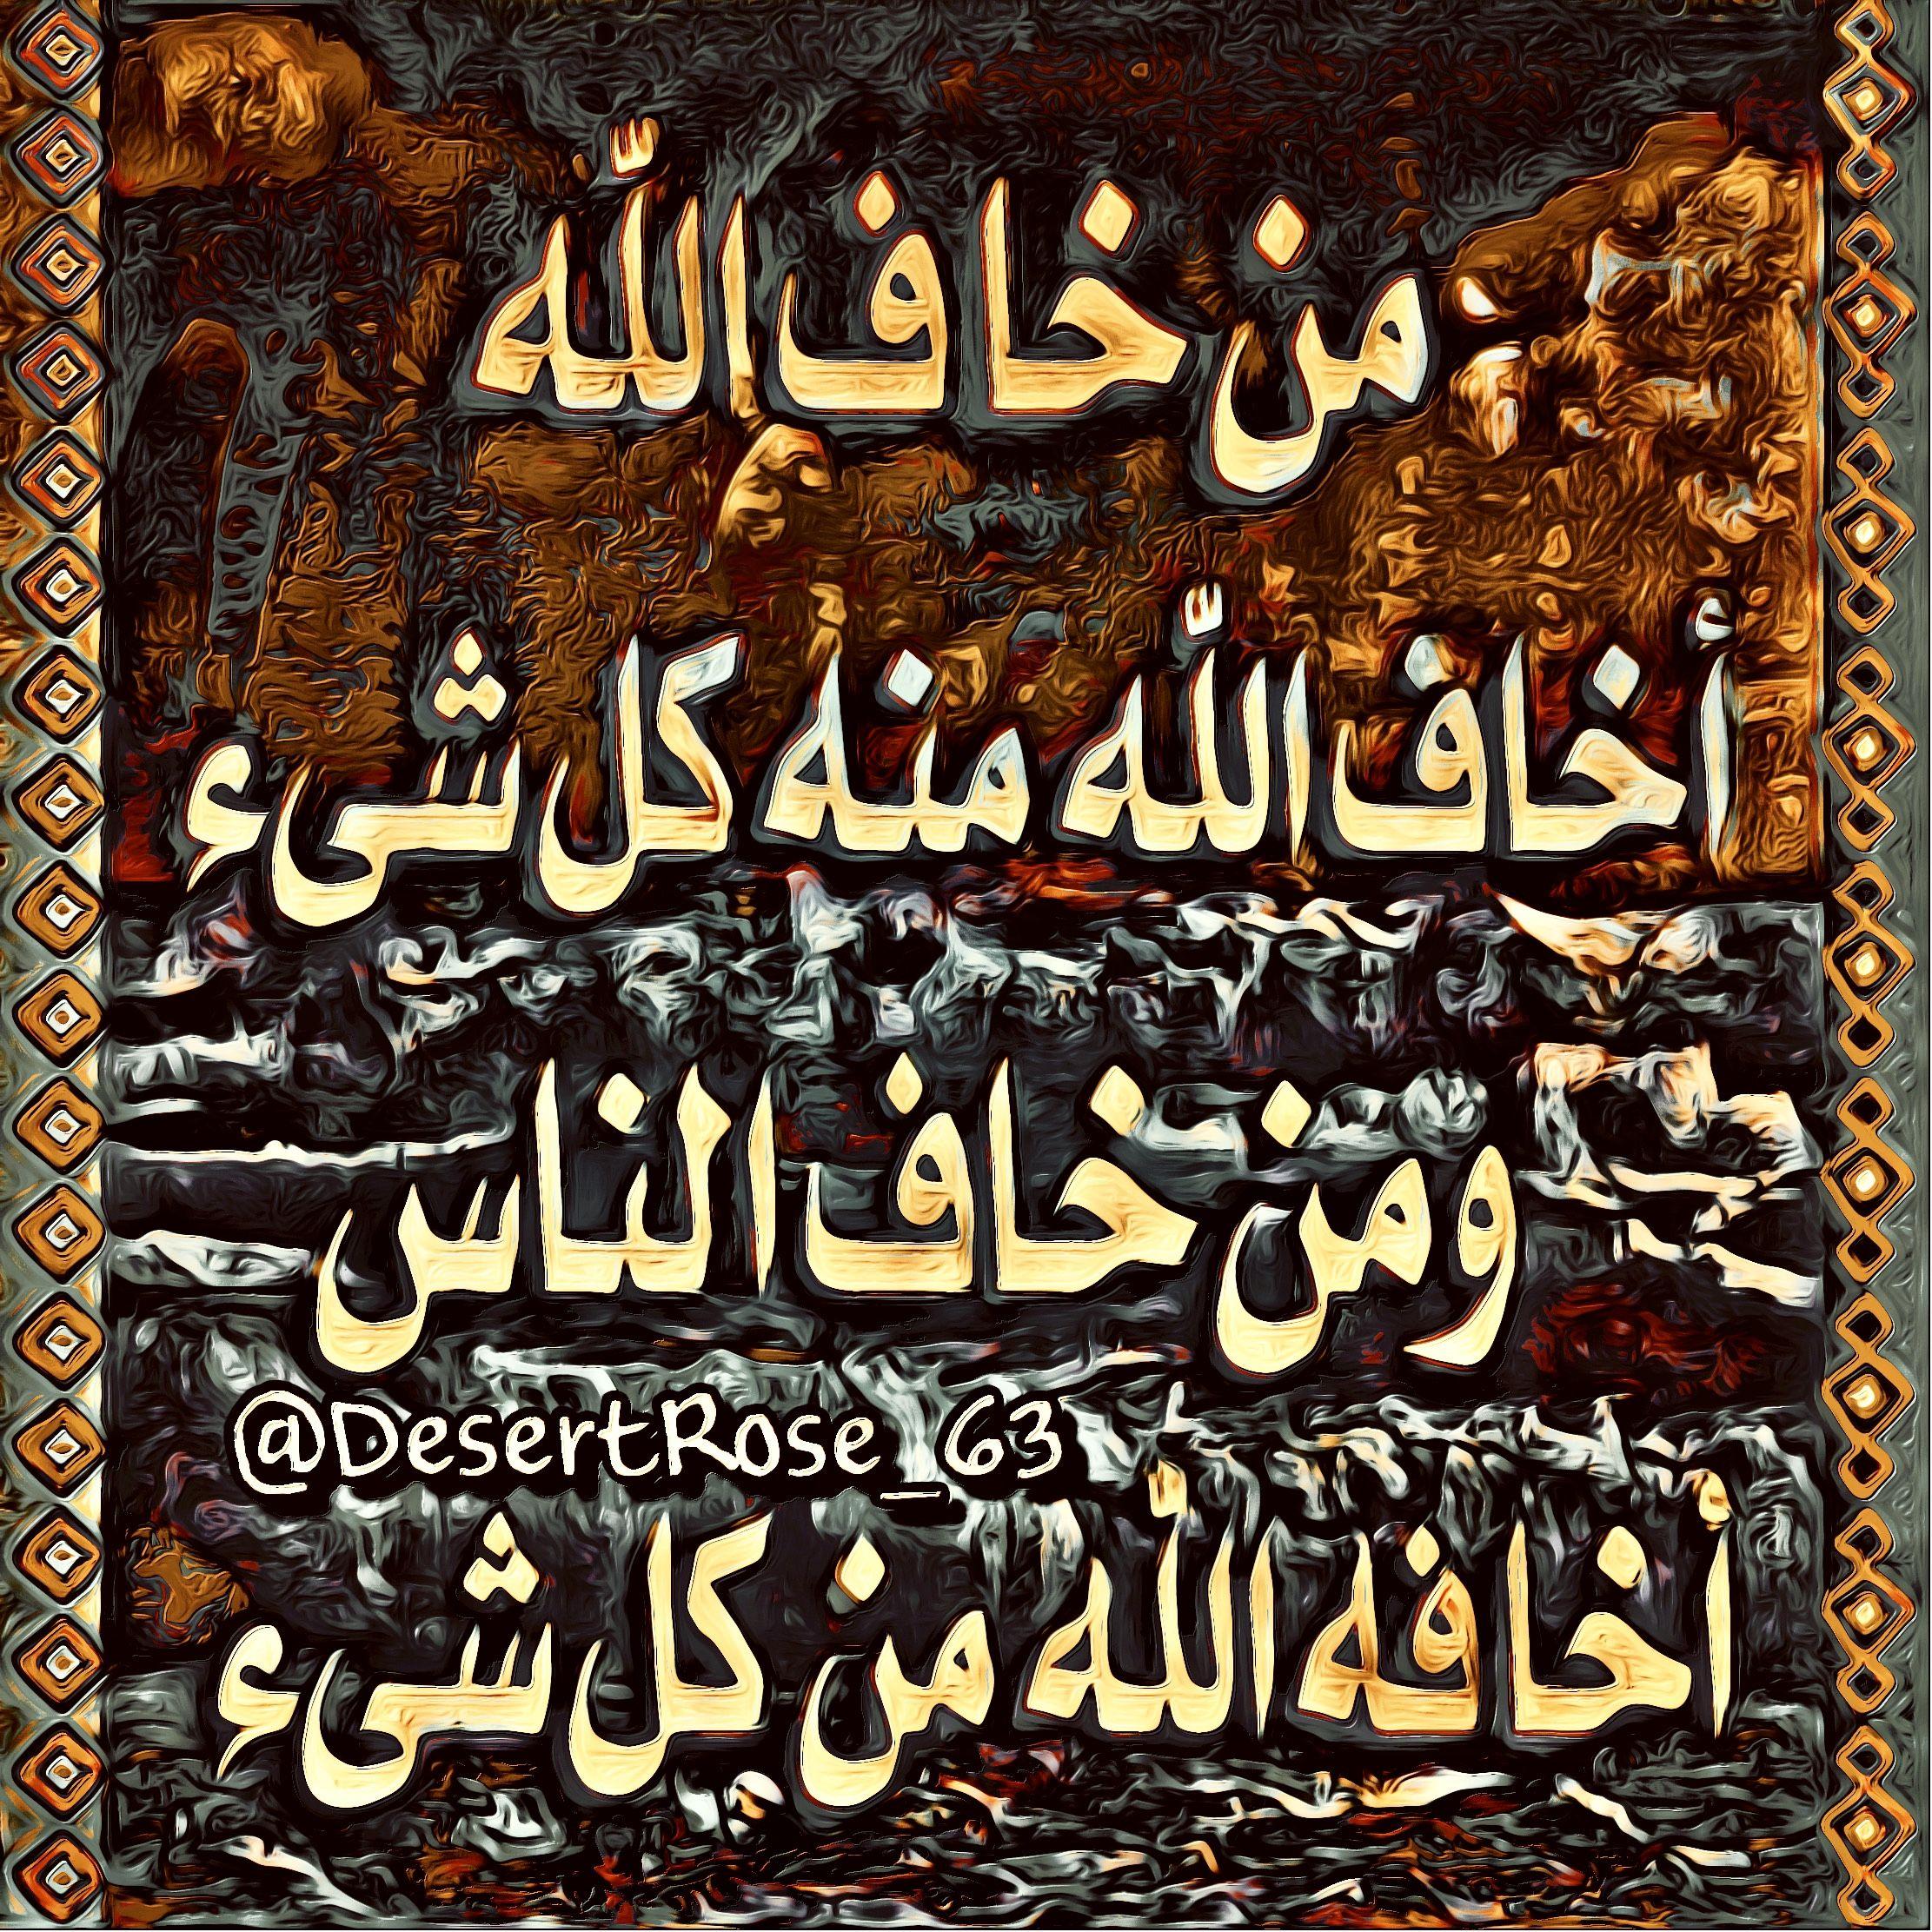 و ل م ن خ اف م ق ام ر ب ه ج ن ت ان 46 سورة الرحمن Arabic Calligraphy Calligraphy